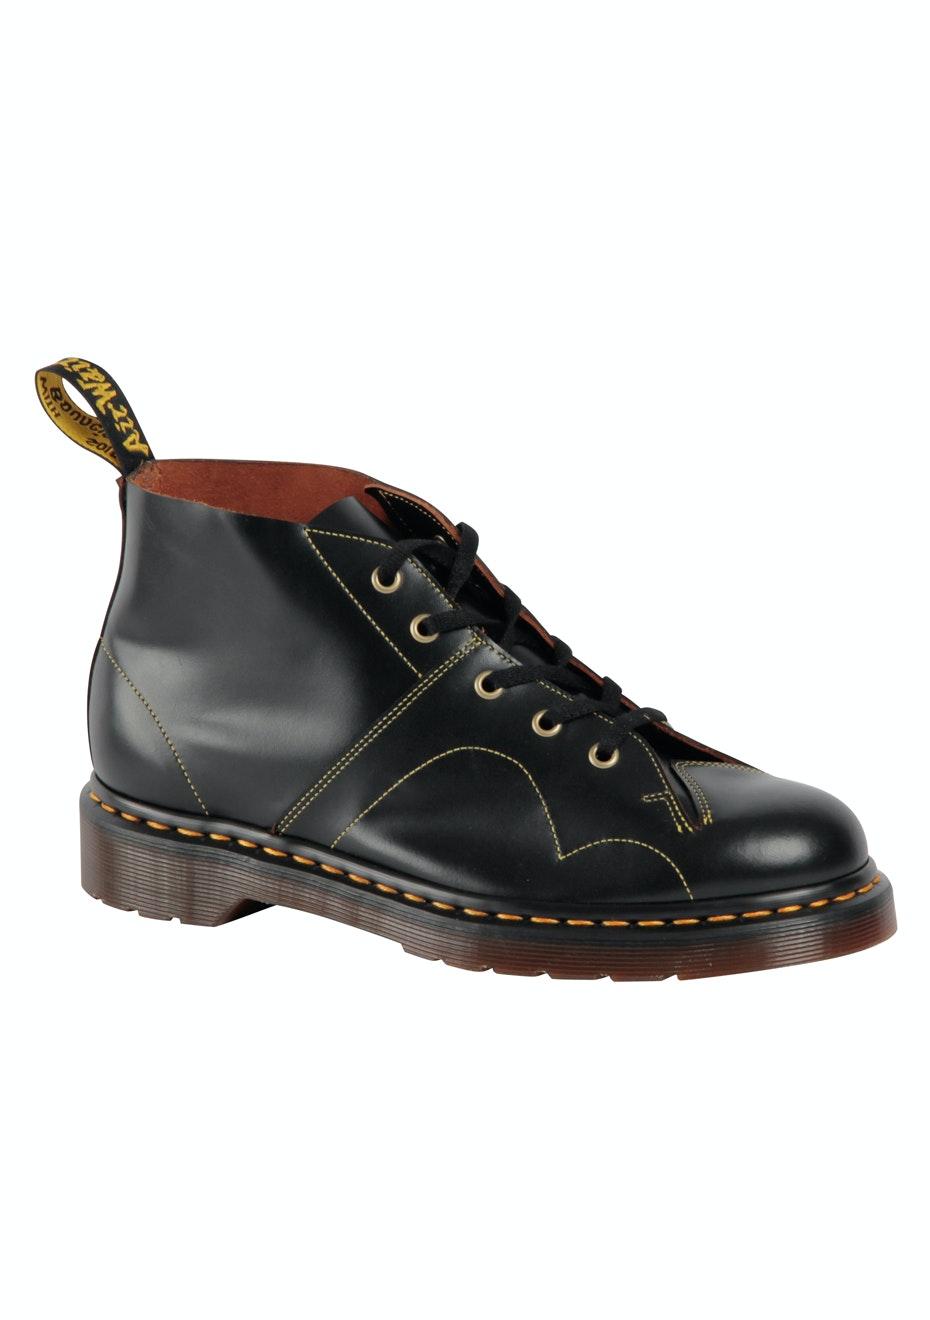 DR MARTENS - Church Monkey Boot - Black